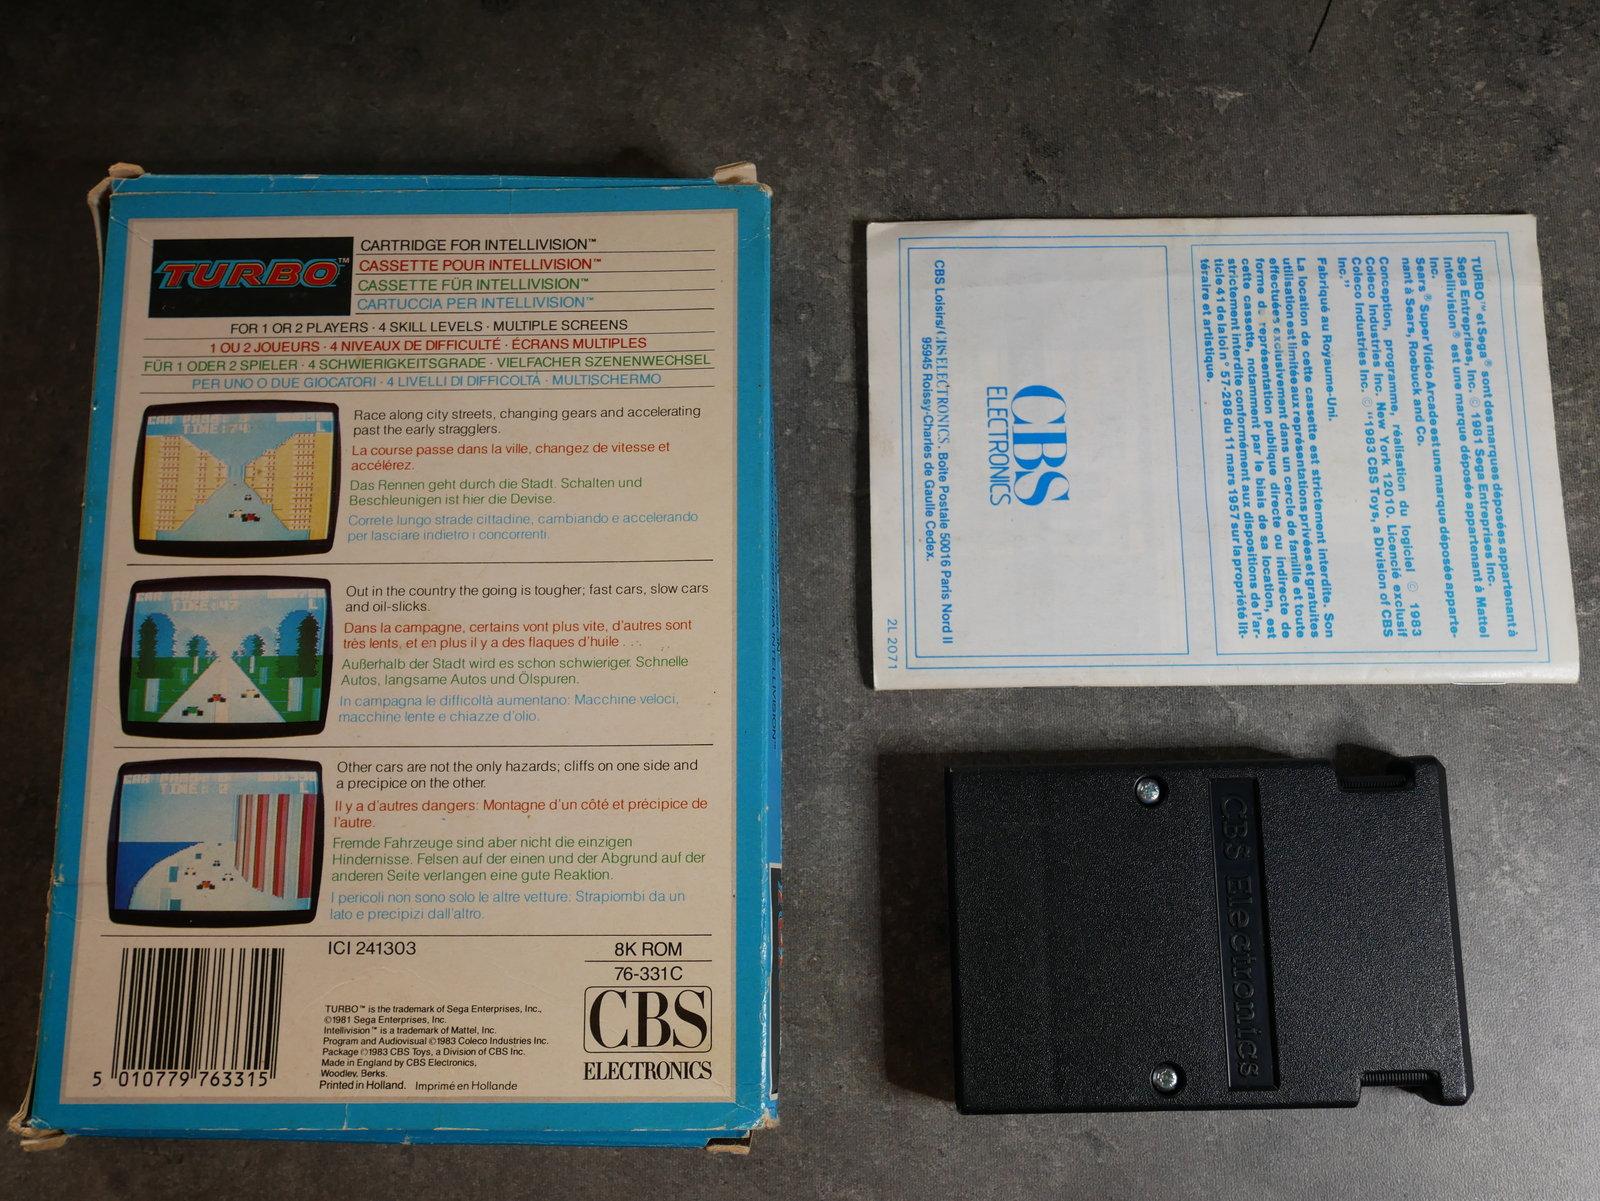 [VENDU] TURBO Intellevision en boite 200408054427141699